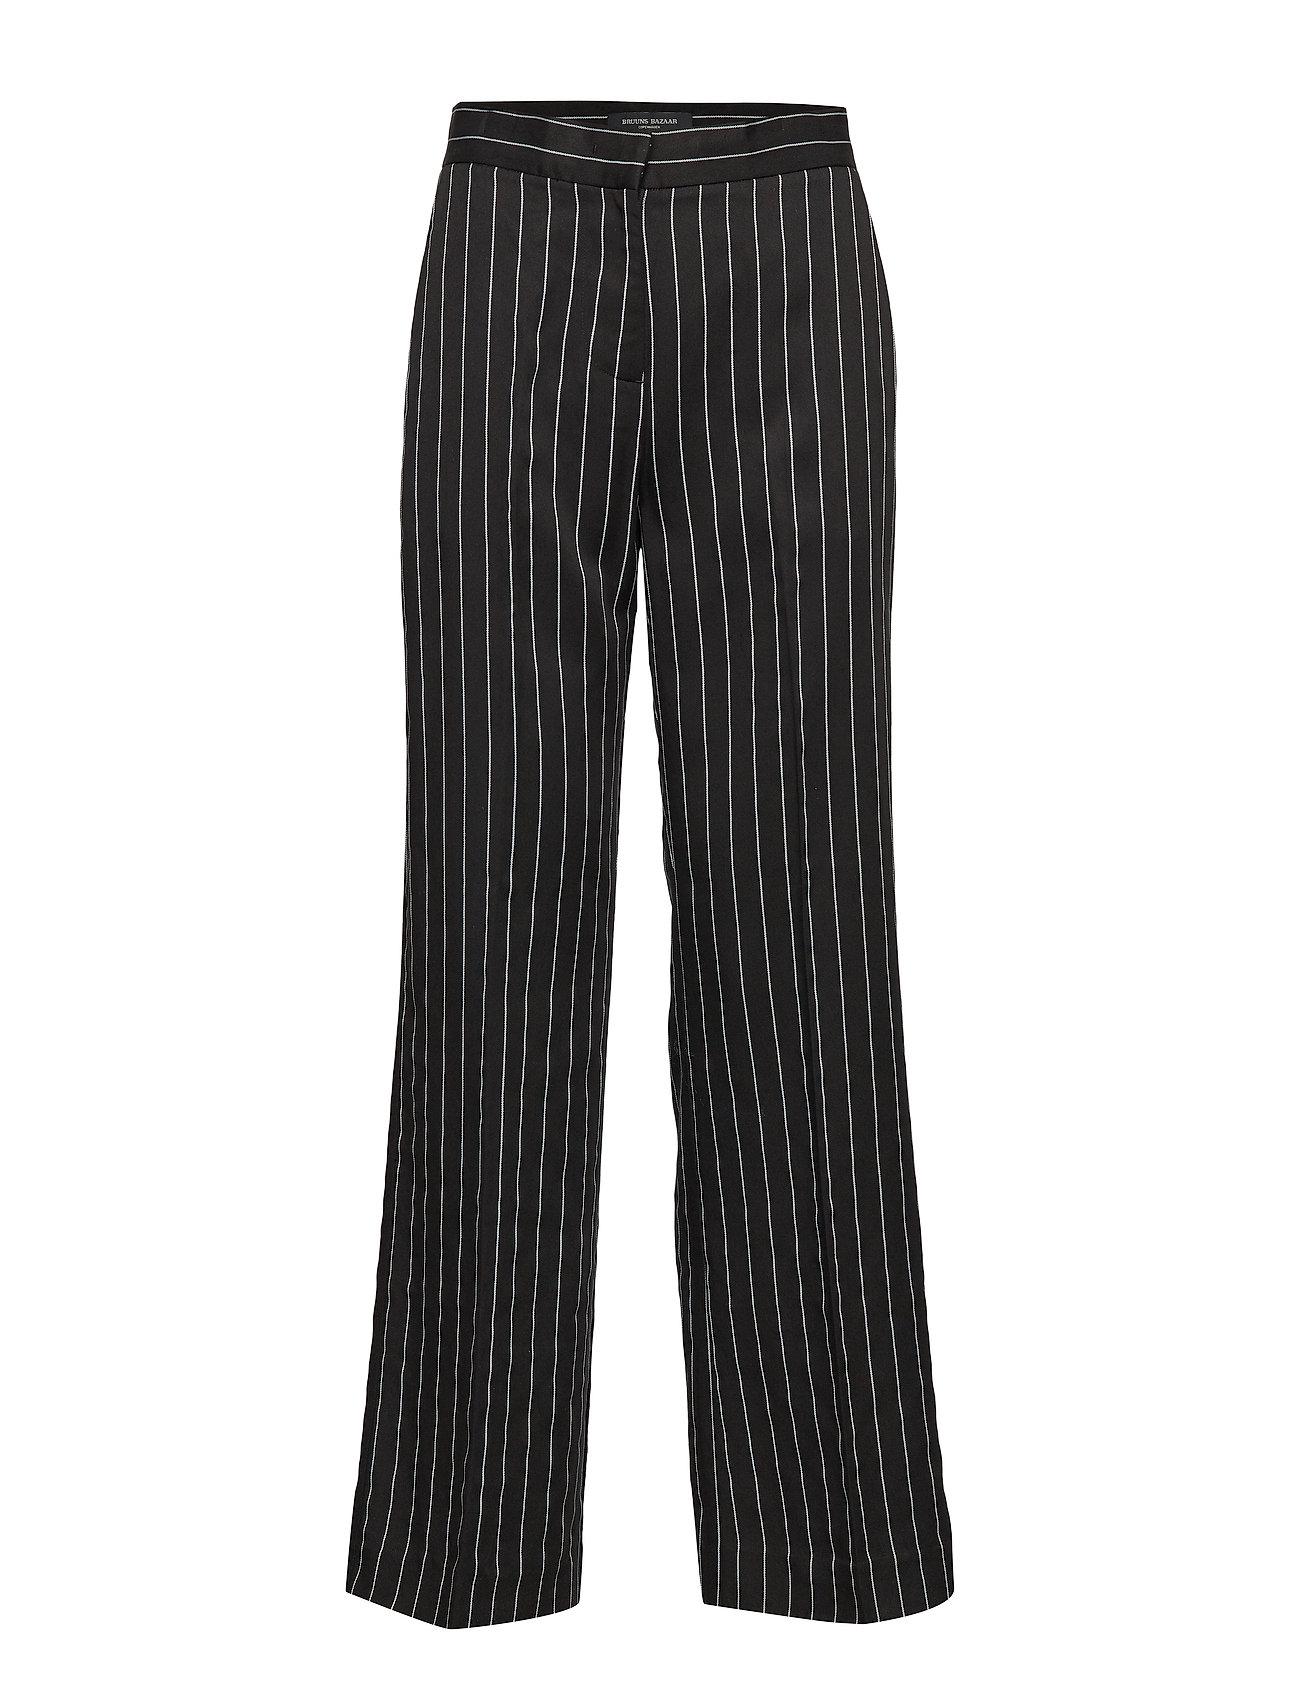 Bruuns Bazaar Brisa Catrine Pant - BLACK/WHITE